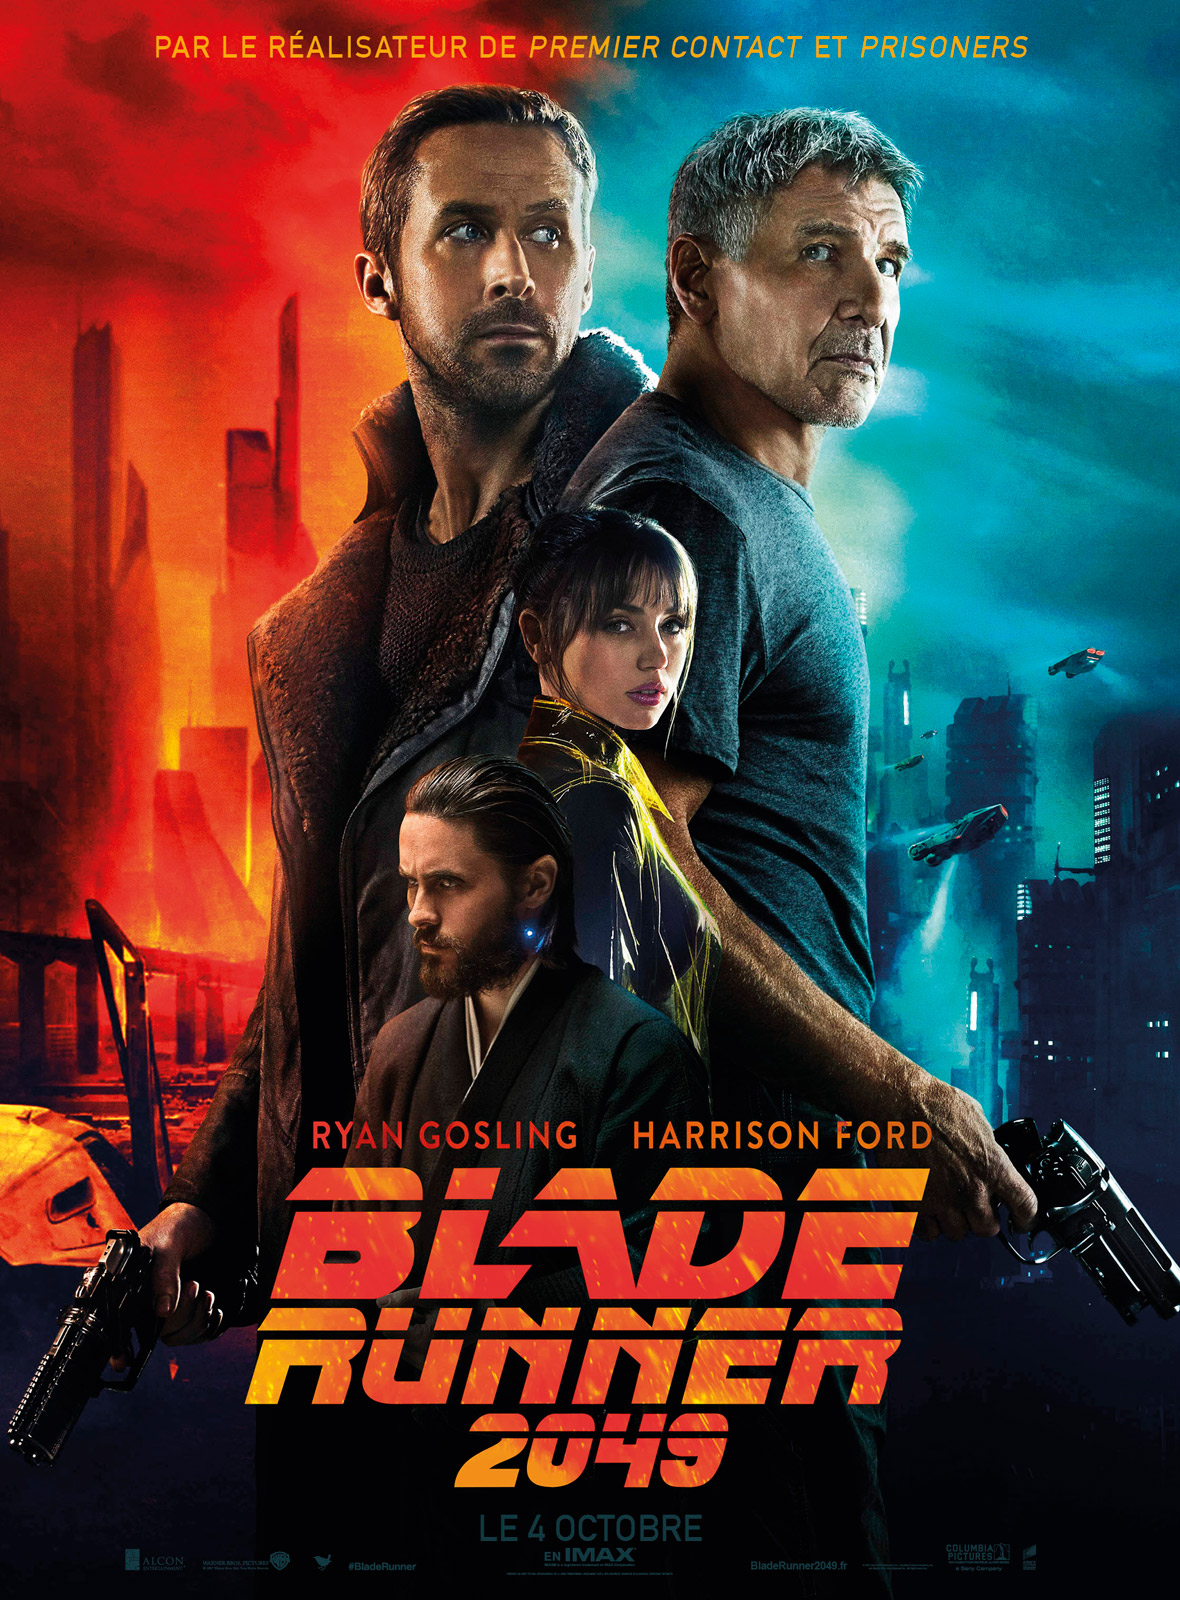 Achat Blade Runner 2049 en Blu Ray - AlloCiné